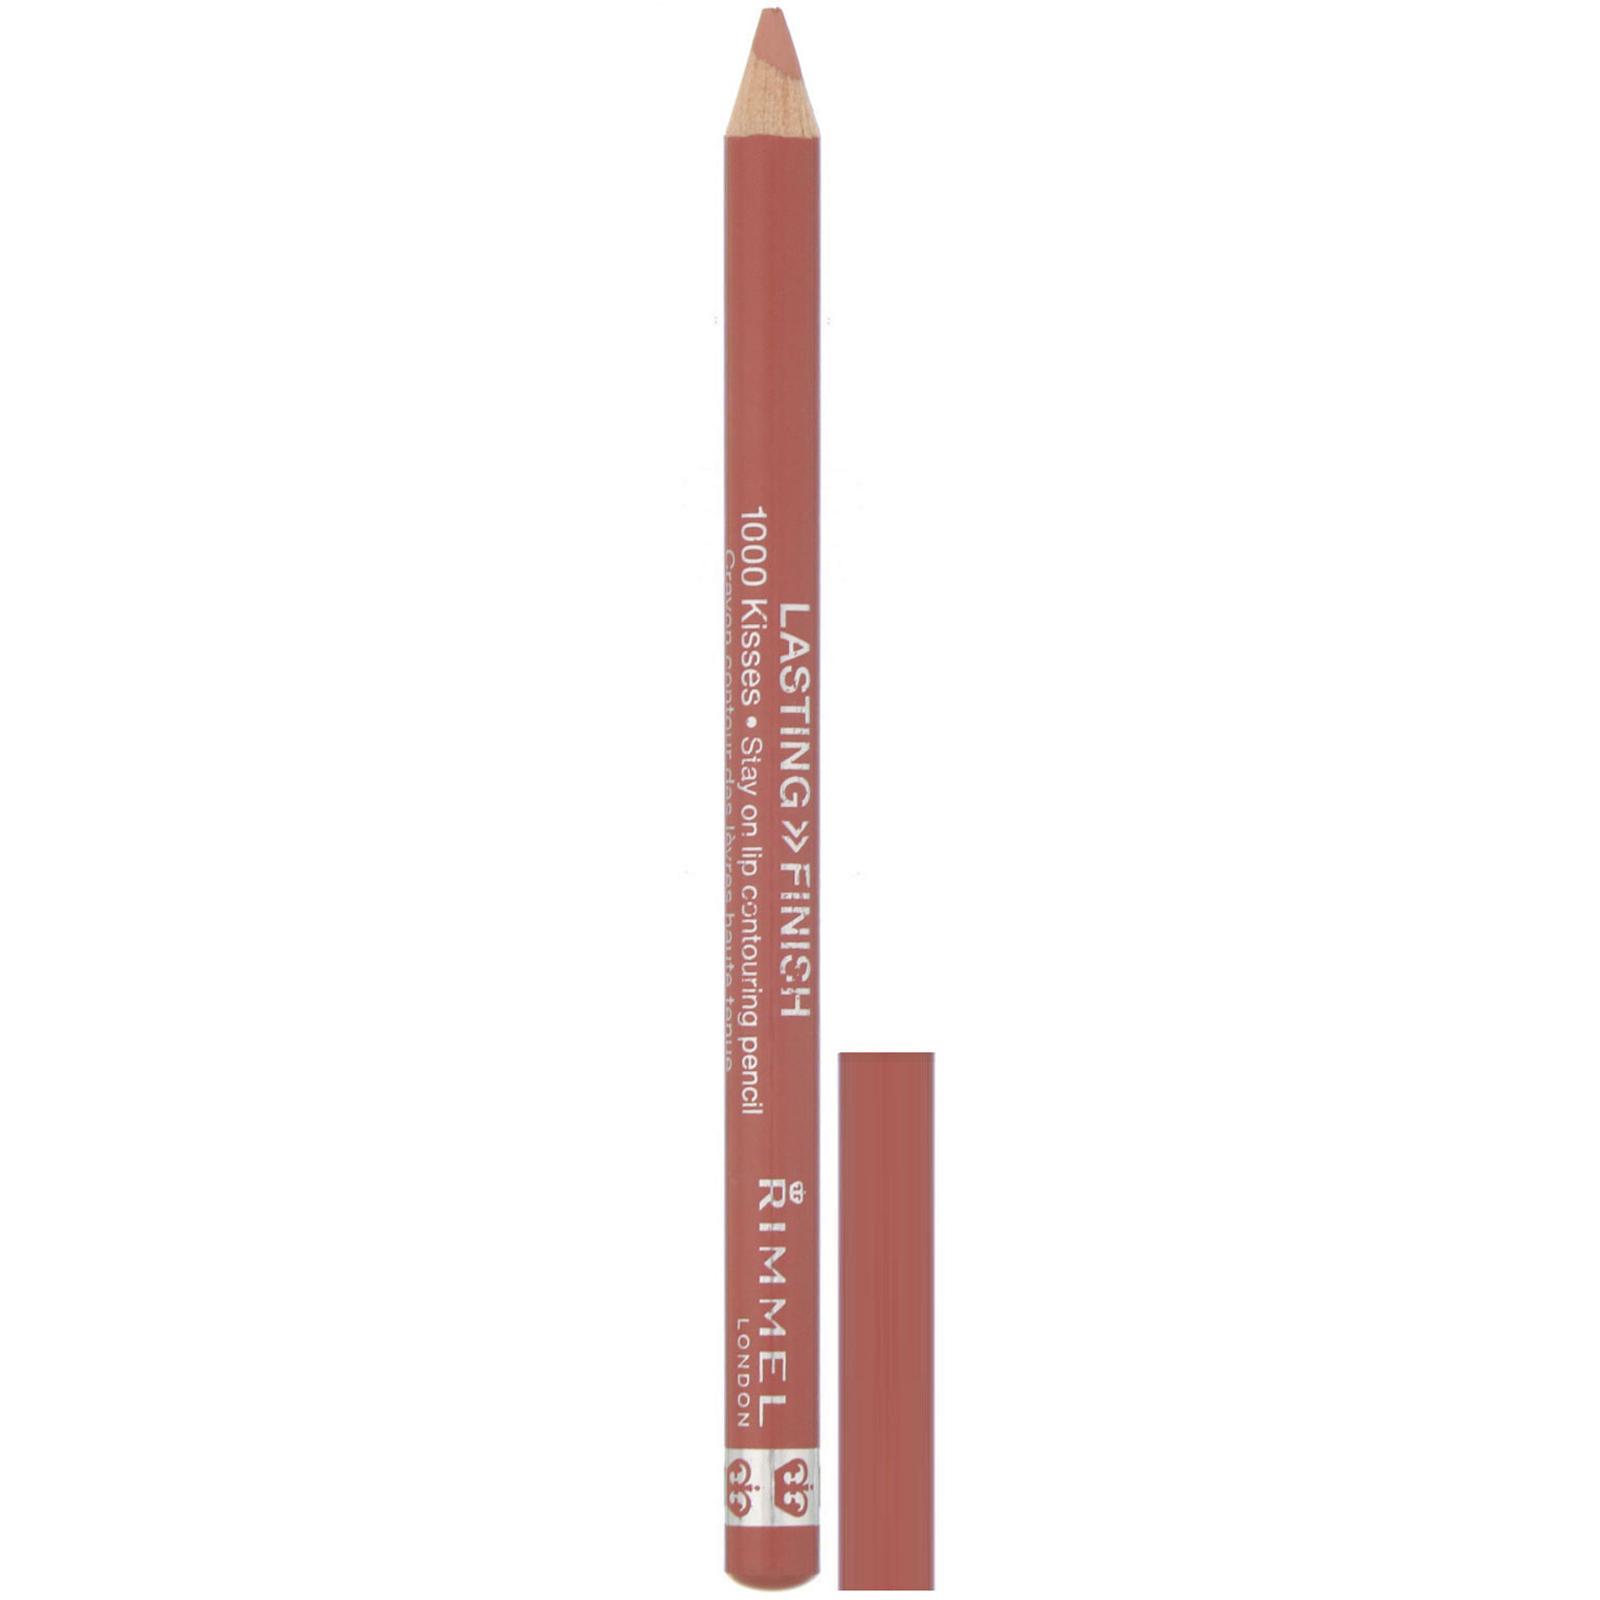 Rimmel London, Контурный карандаш для губ Lasting Finish, 1000 Kisses Stay On, оттенок 081 «Пикантный нюд», 1,2 г